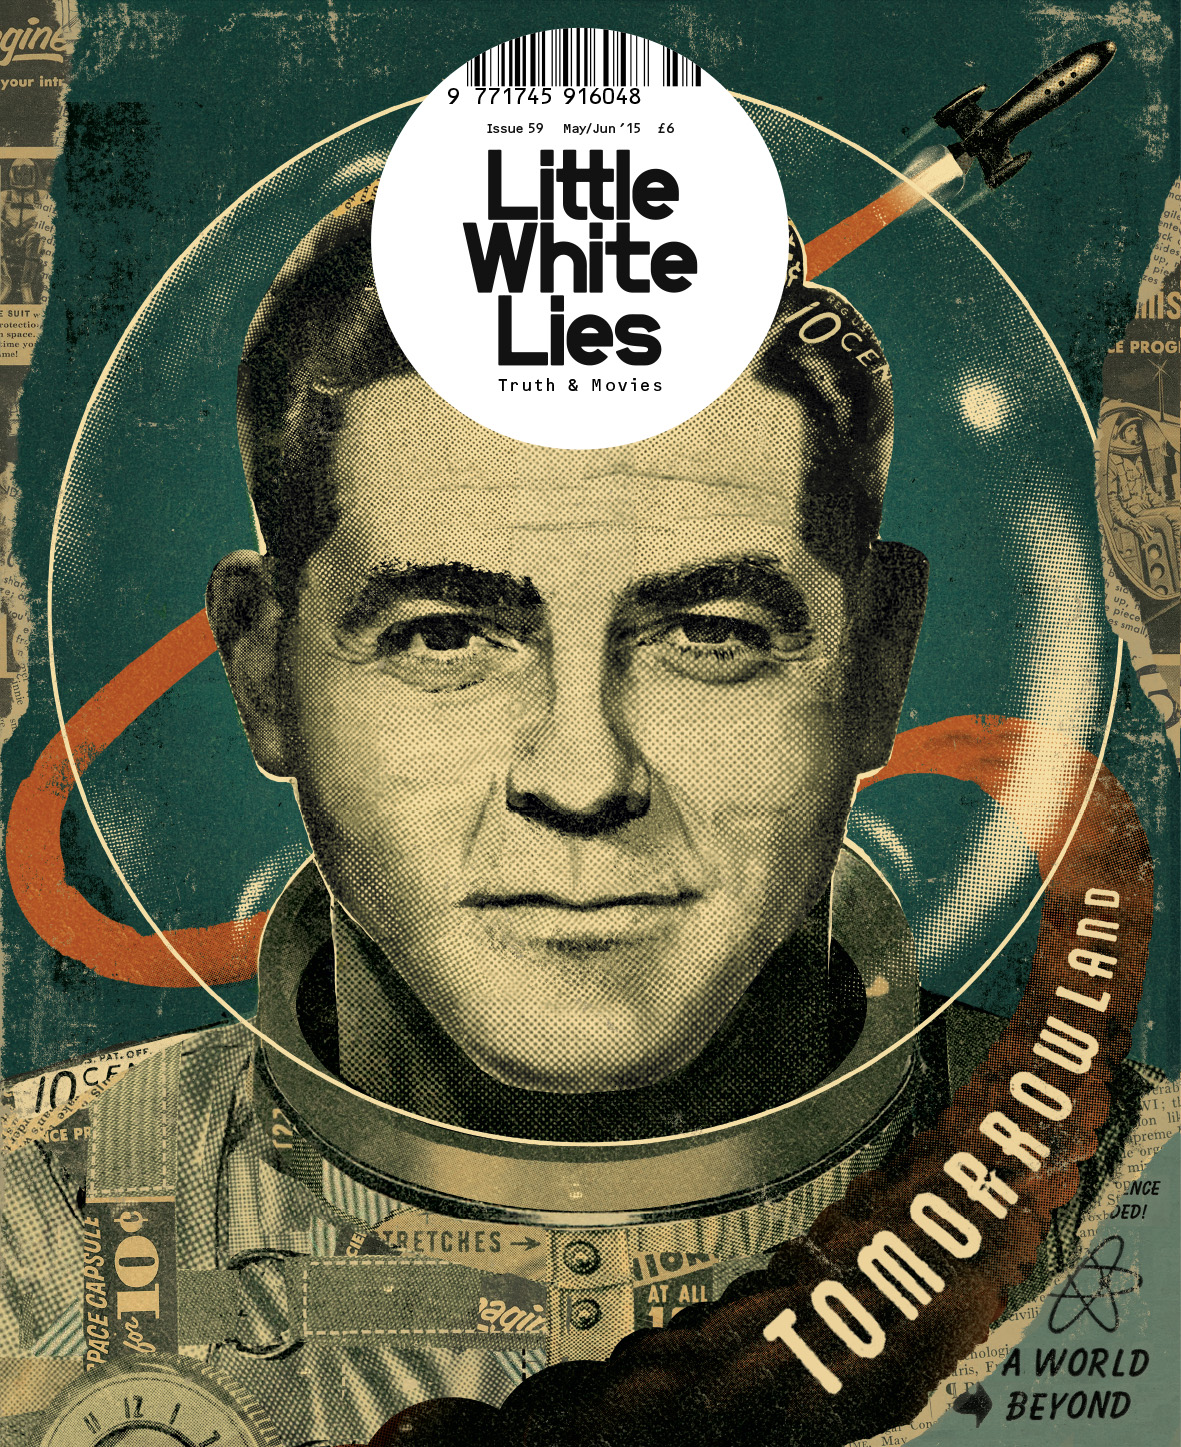 Little White Lies #59: Tomorrowland